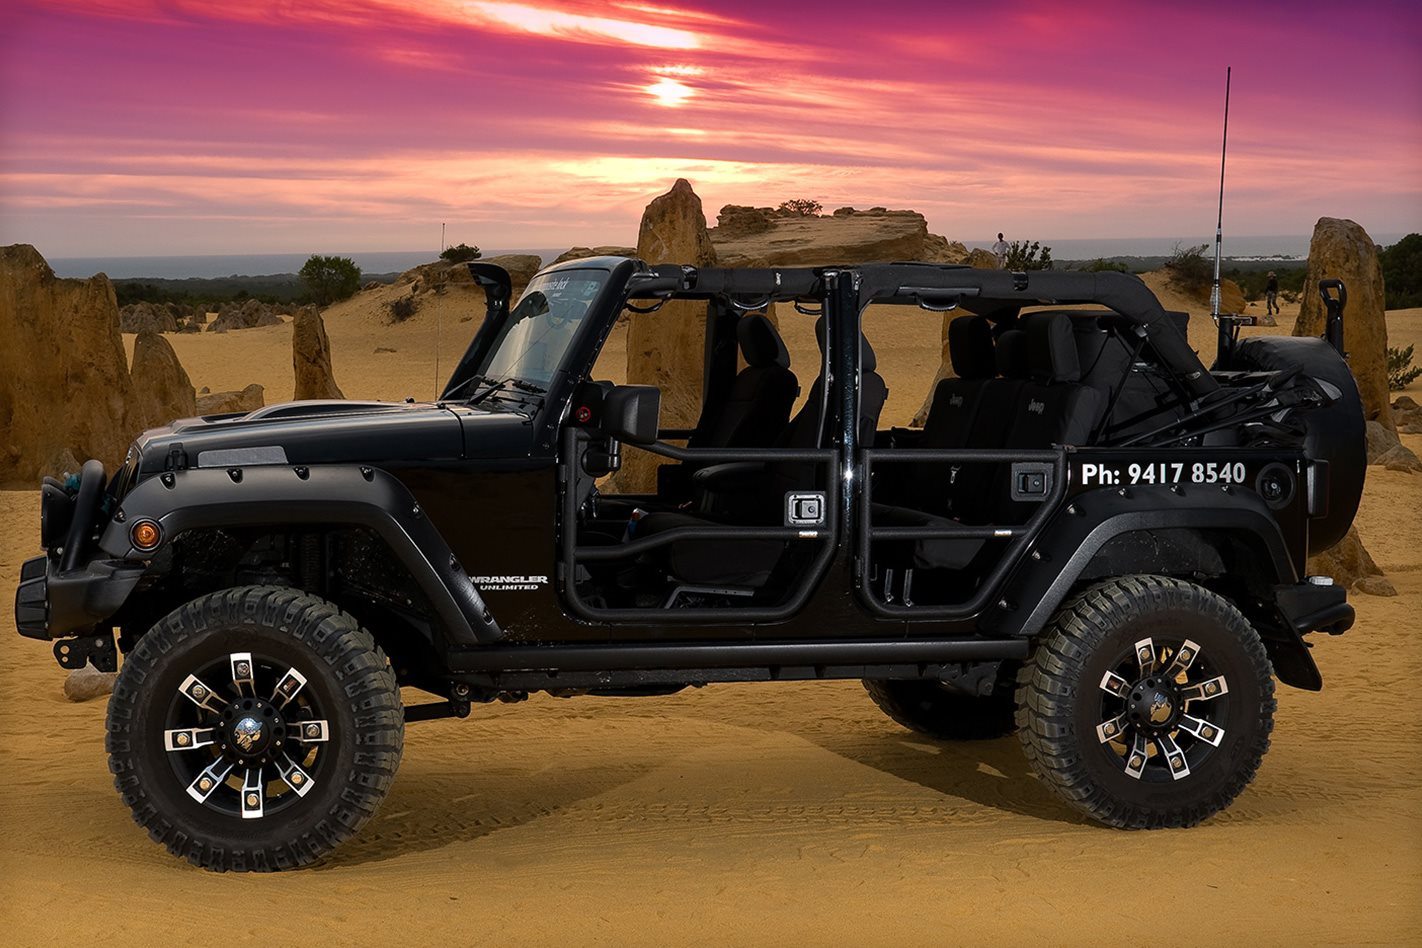 Jeep-Wrangler-Rubicon-side.jpg